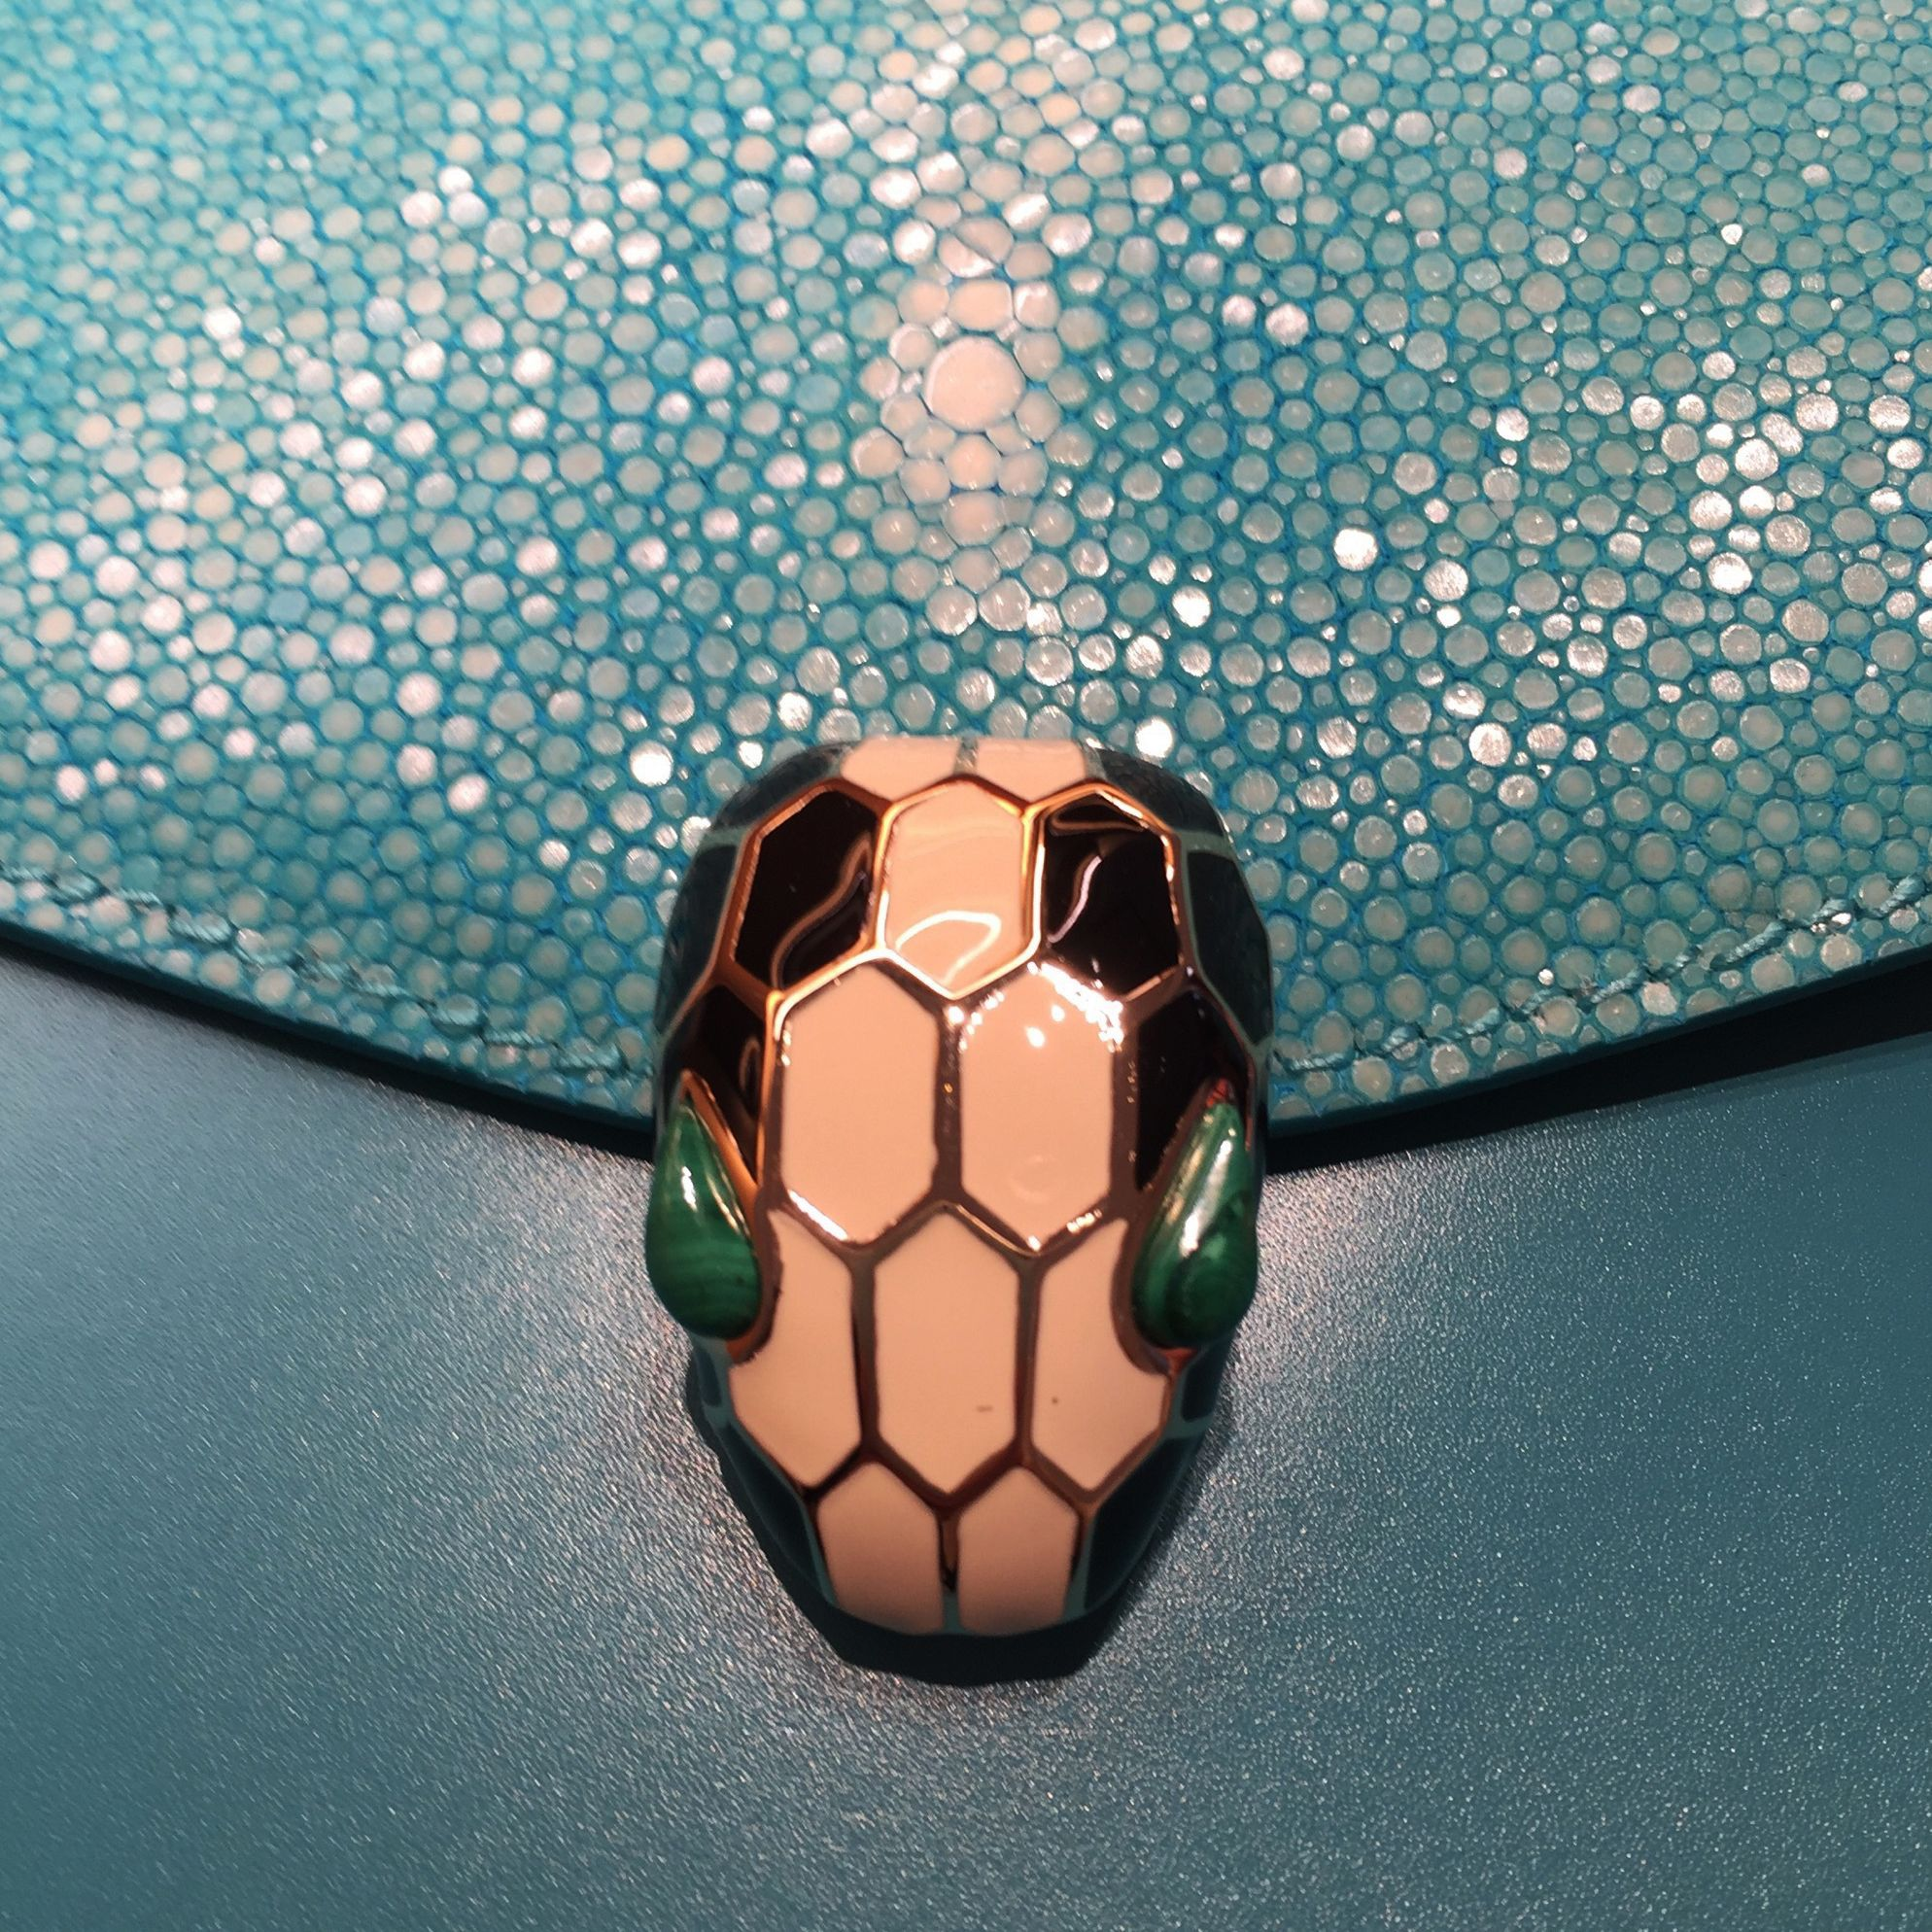 Bulgari Serpenti handbag with enamel  serpent clasp detail on blue galuchat skin.